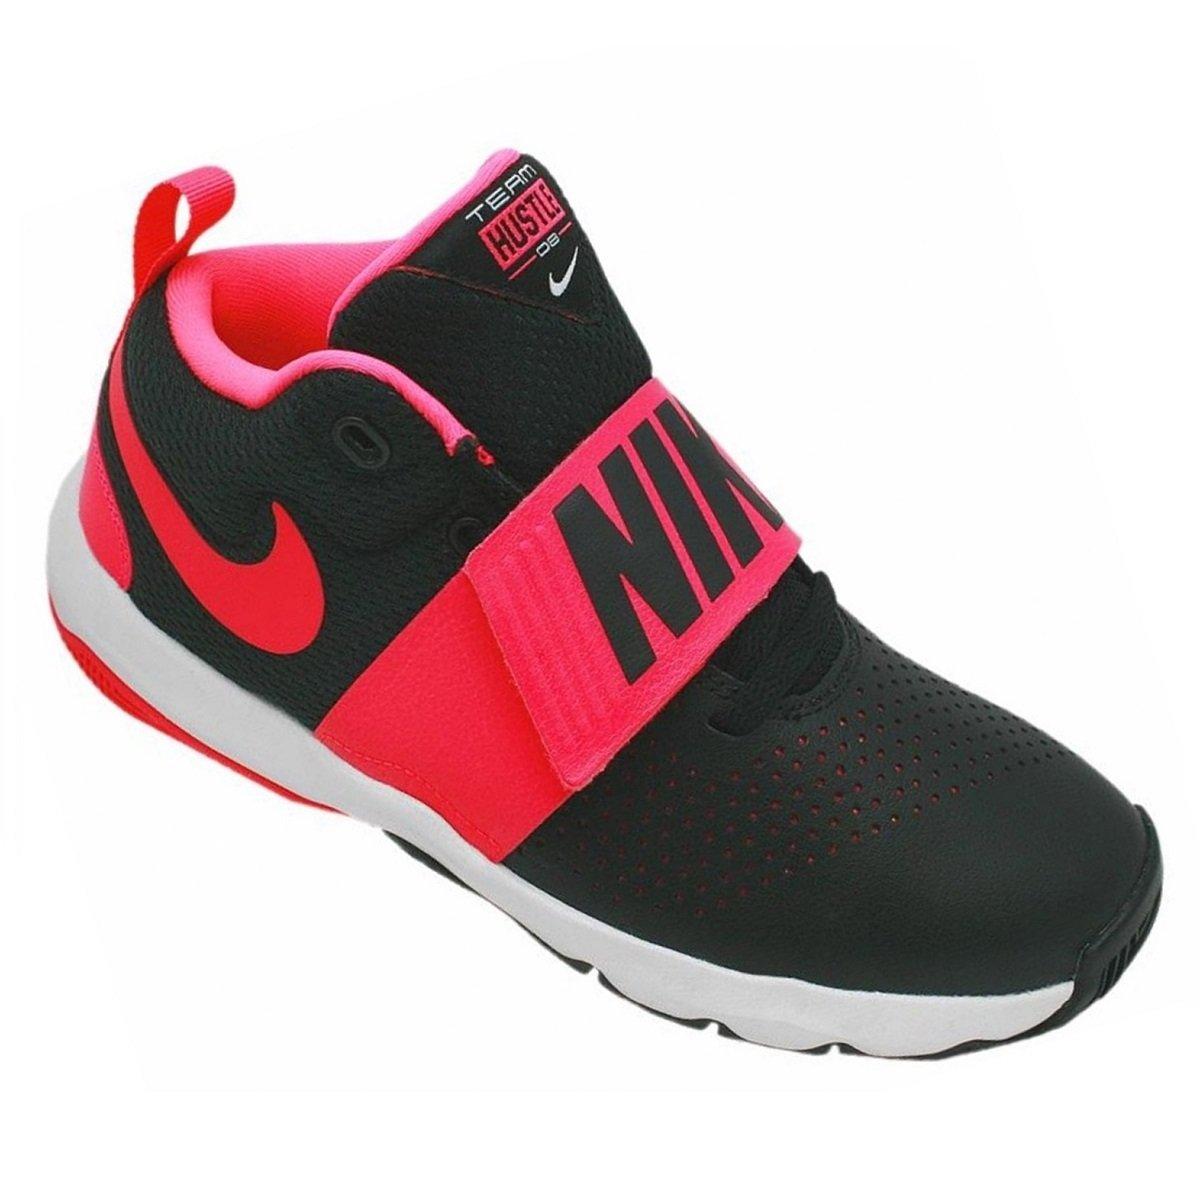 8f96a22ae79 Tênis Infantil Nike Team Hustle D 8 881941-002 - Preto Pink - Botas ...